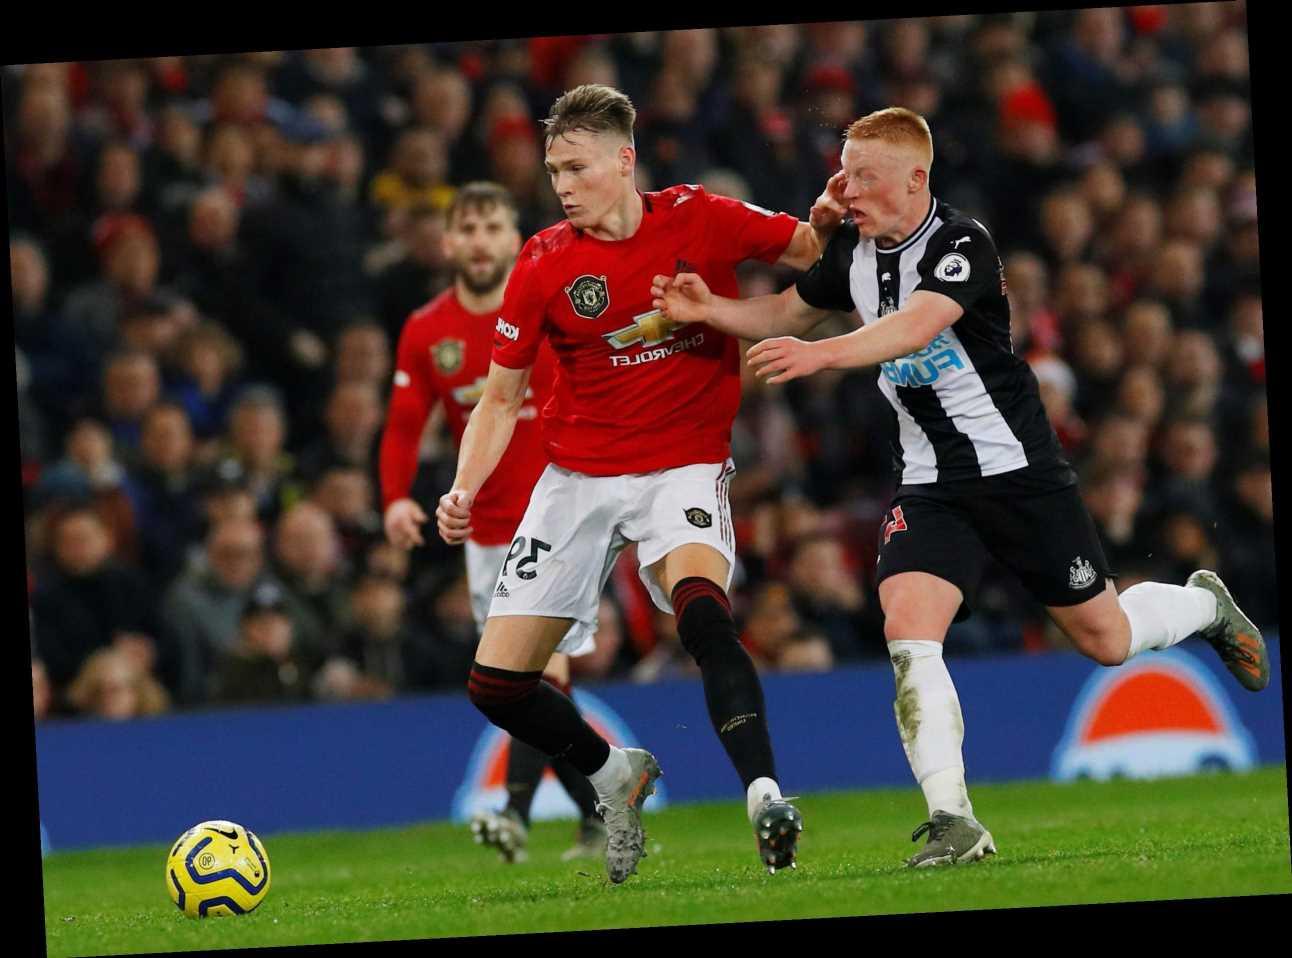 Newcastle vs Man Utd: Live stream, TV channel, team news, kick off time for TONIGHT'S Box Office clash